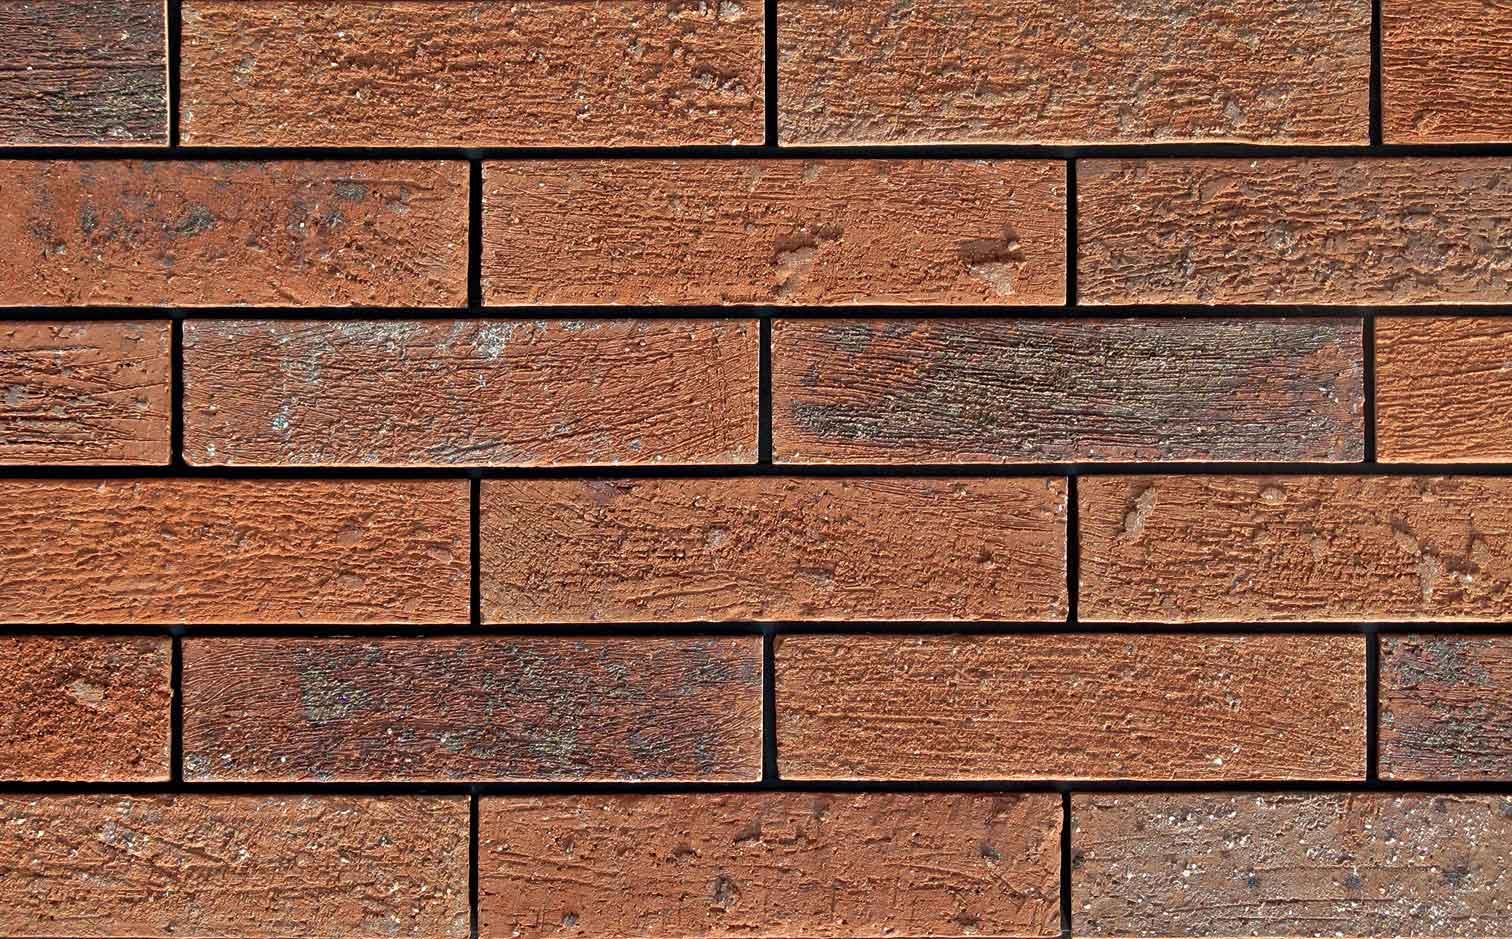 Clay Tile Wall Brick Wxs6321 Lopo China Terracotta Facade